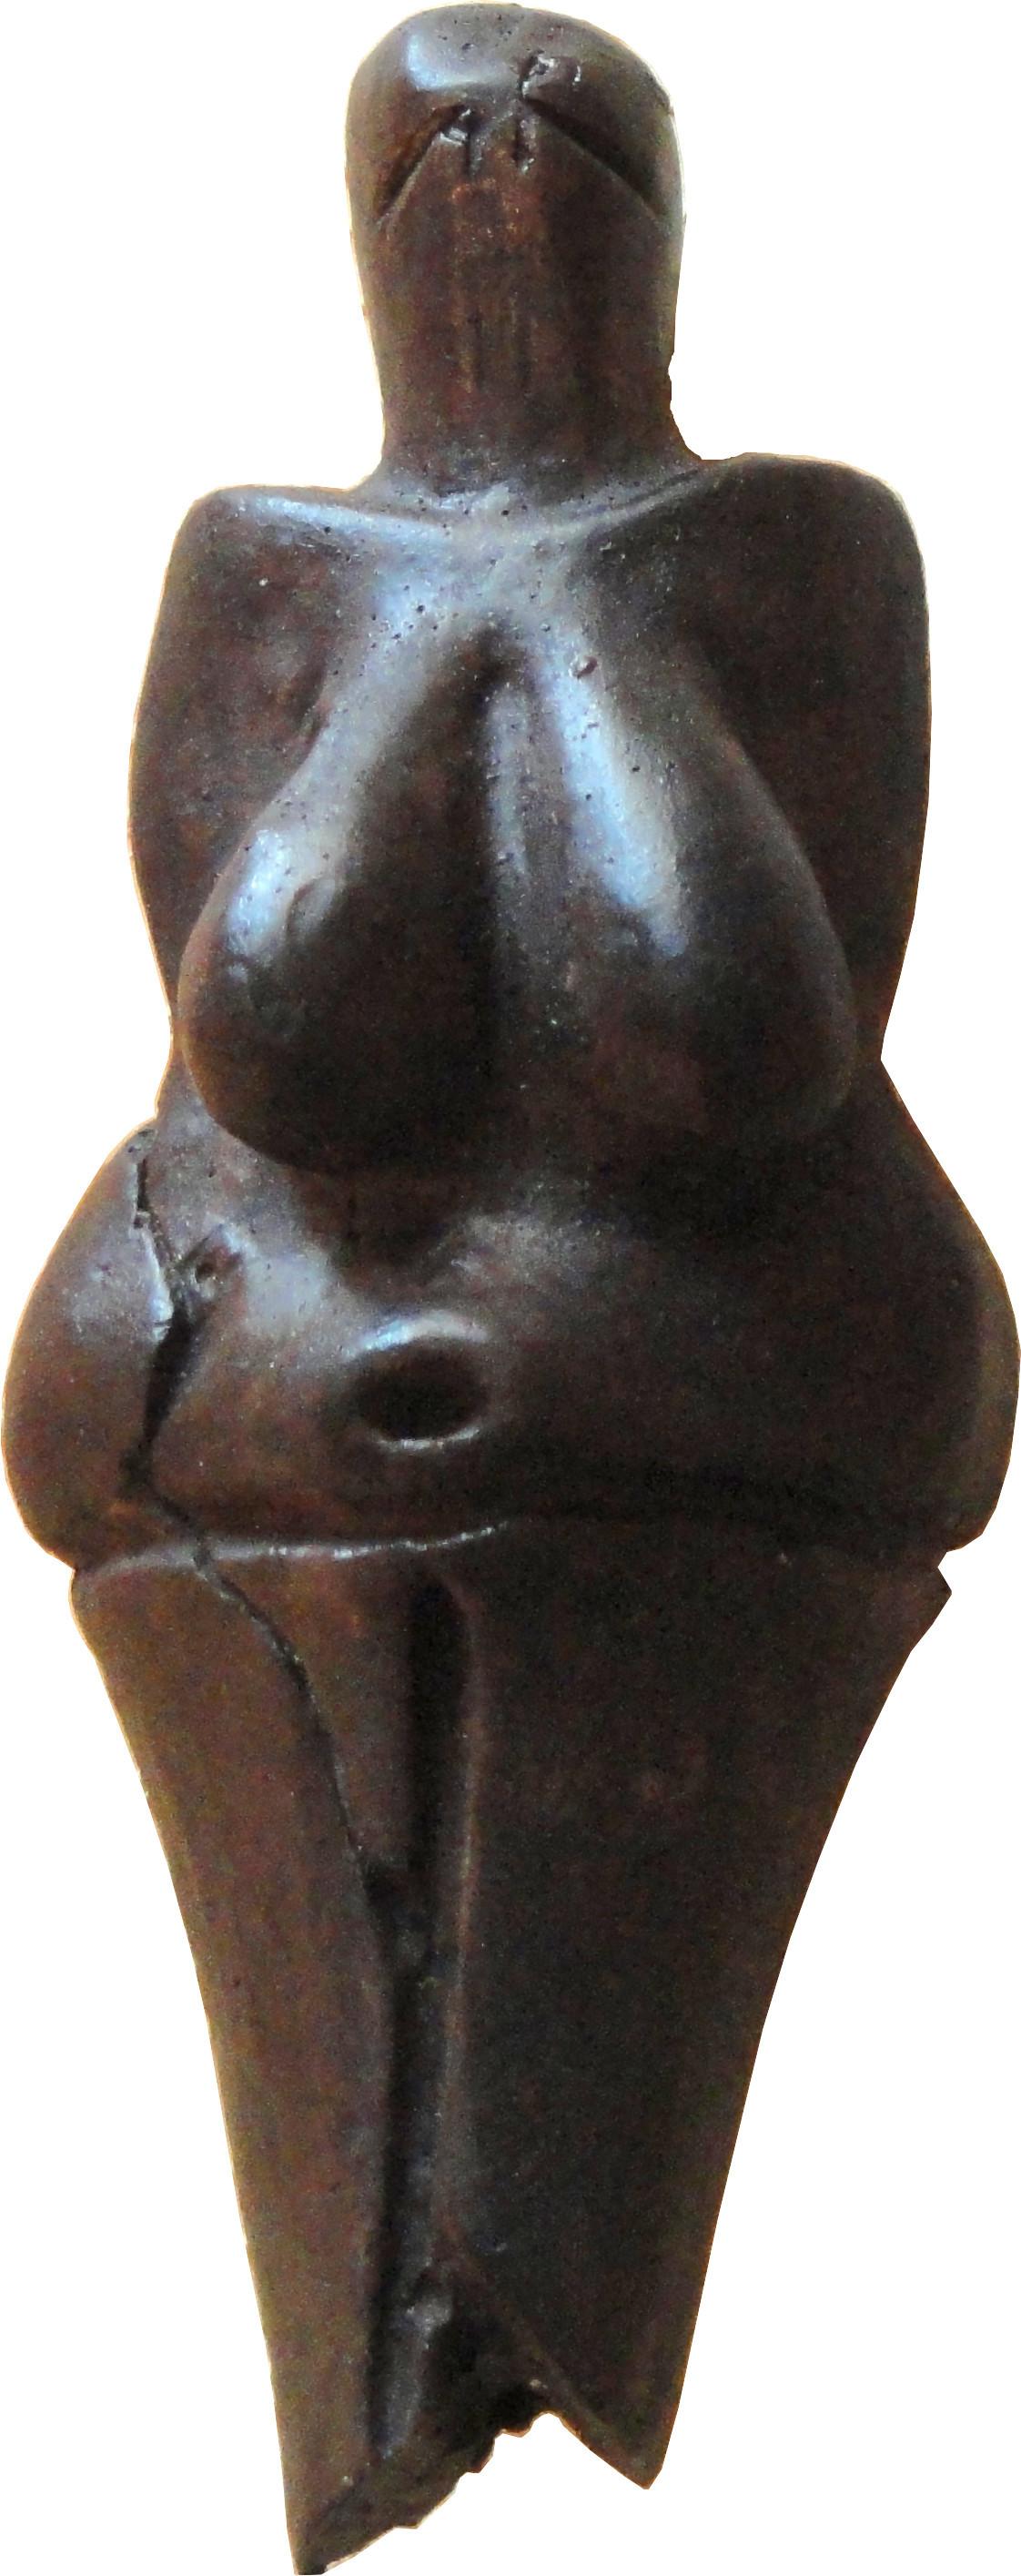 Soška Věstonické Venuše